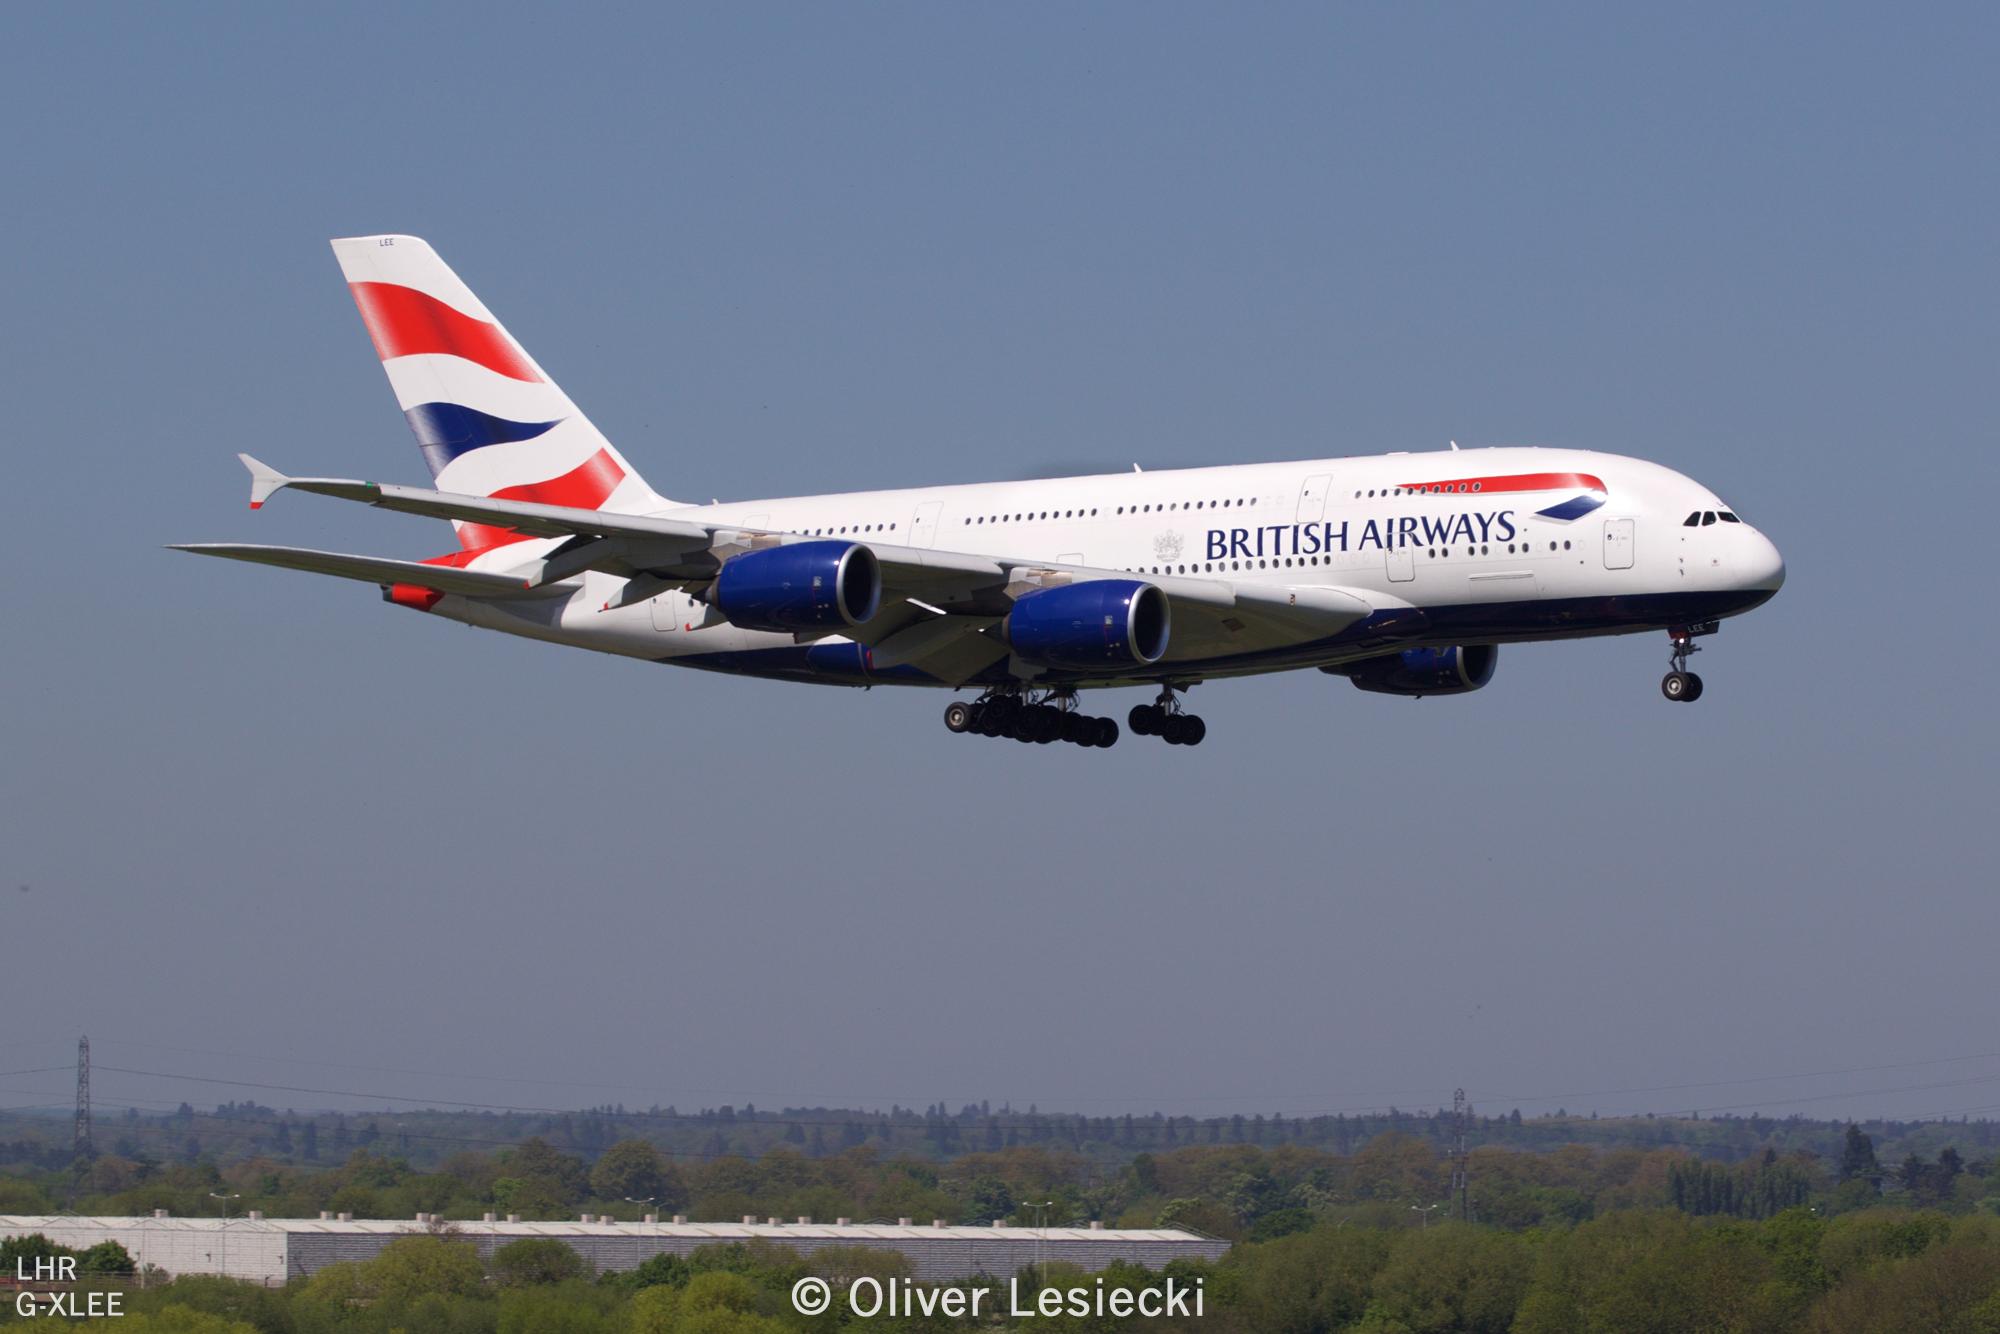 A_British_A380_GXLEE_01_LHR_050518_IG7